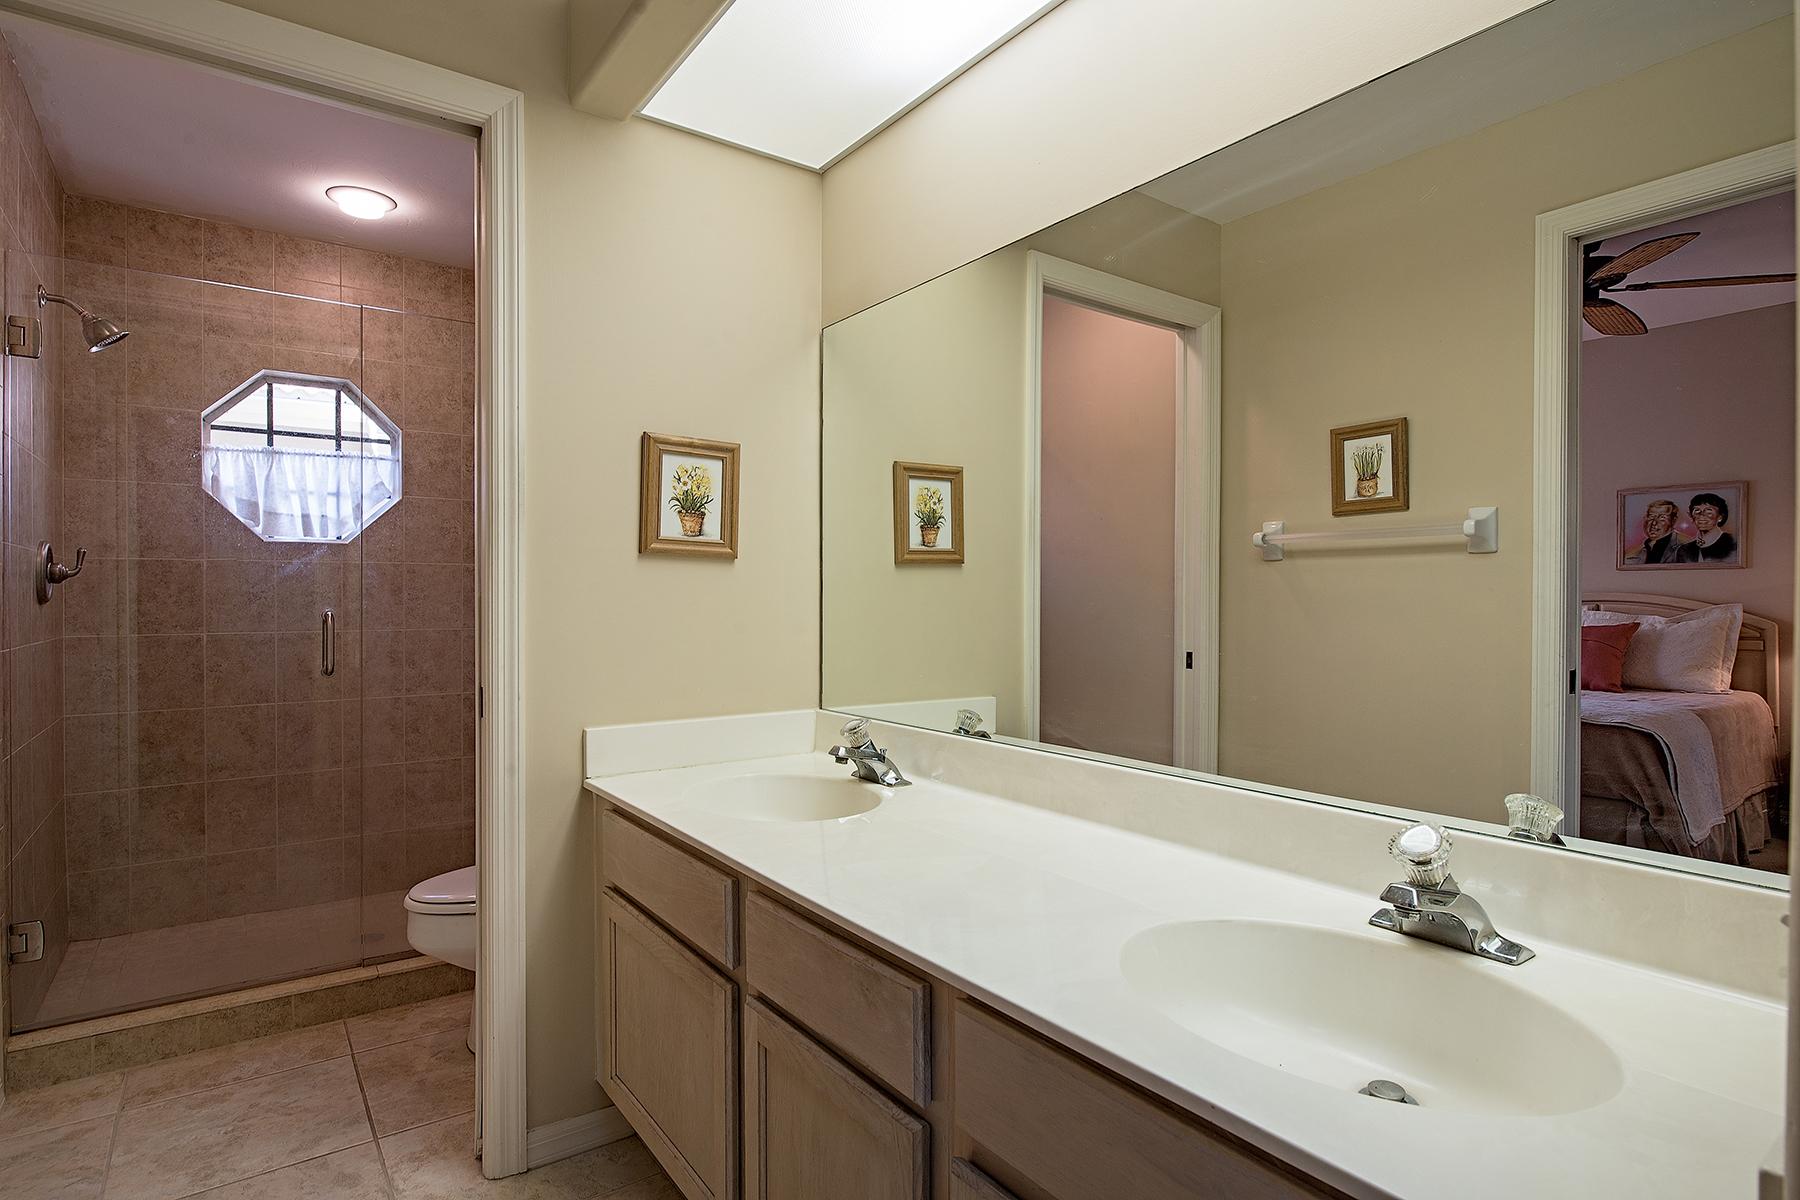 Additional photo for property listing at WORTHINGTON 28008  Cavendish Ct 4902,  Bonita Springs, Florida 34135 United States